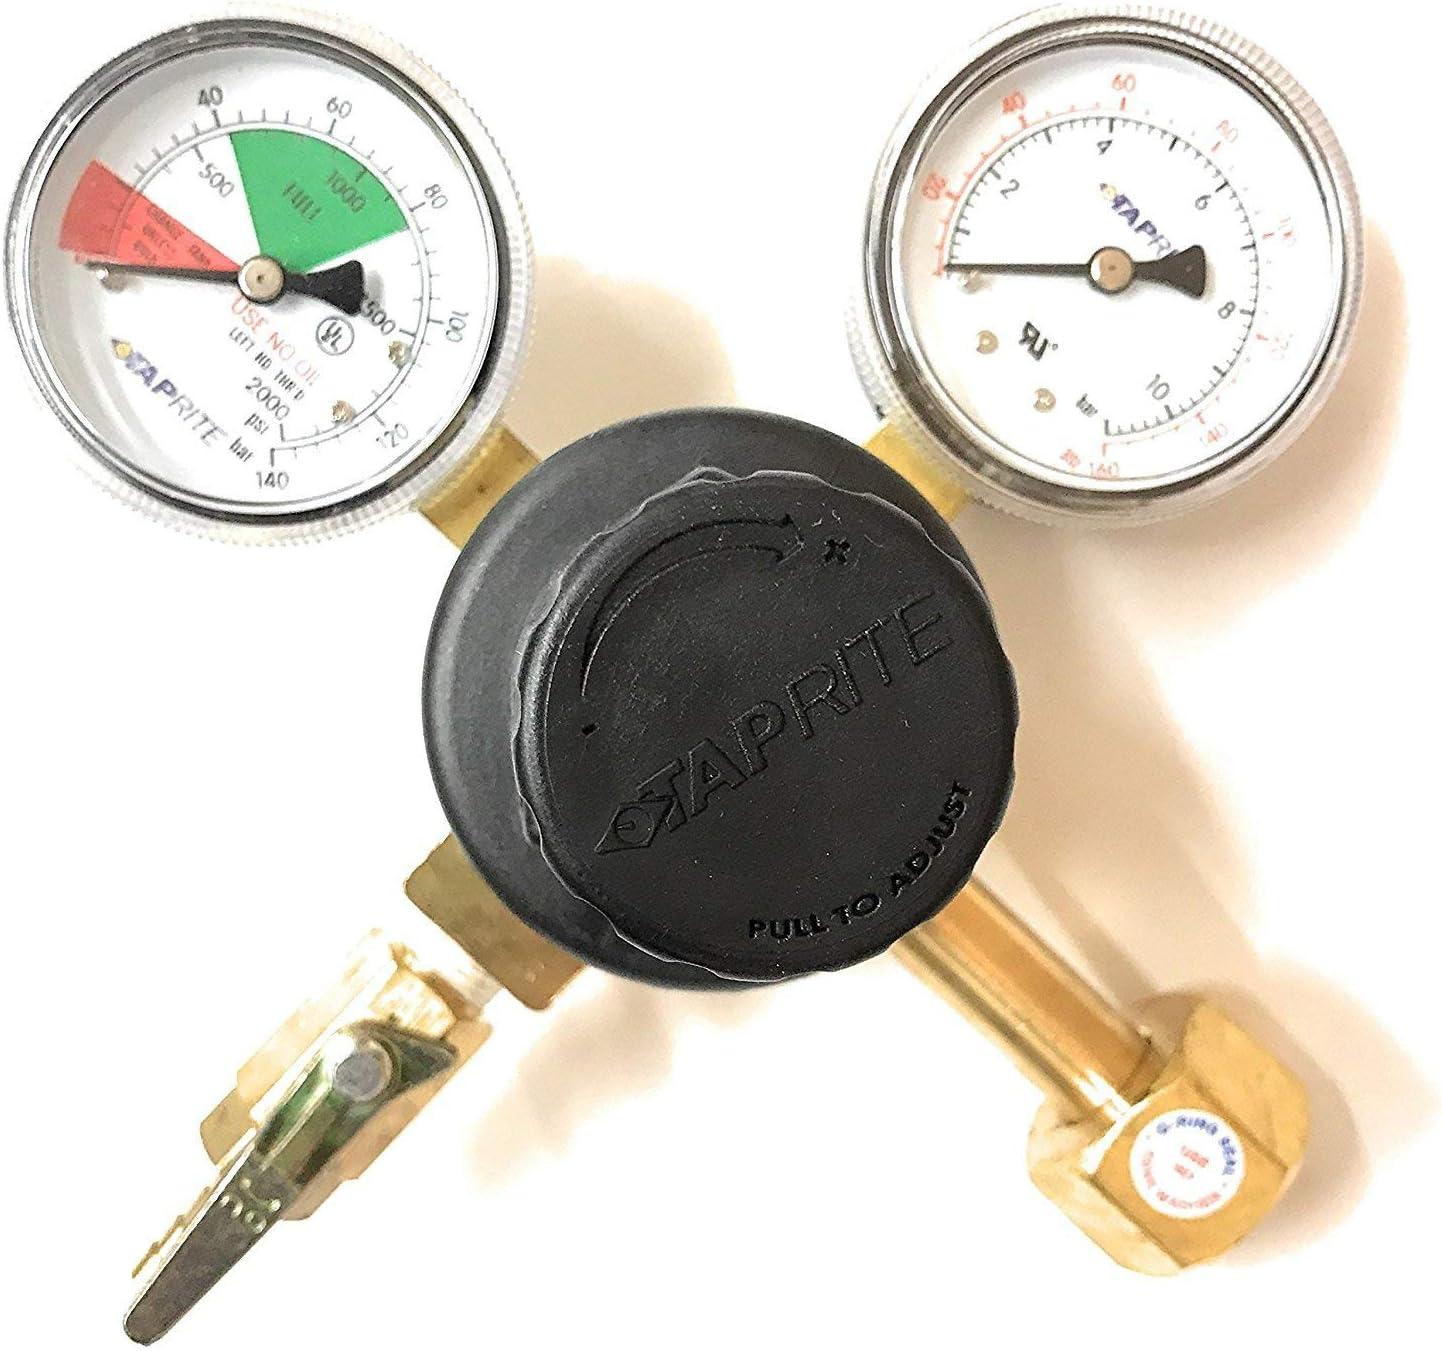 "Taprite 1/4"" Barb Outlet Primary Beer Soda Co2 Tank Tap Regulator 160# 2000# High Pressure"